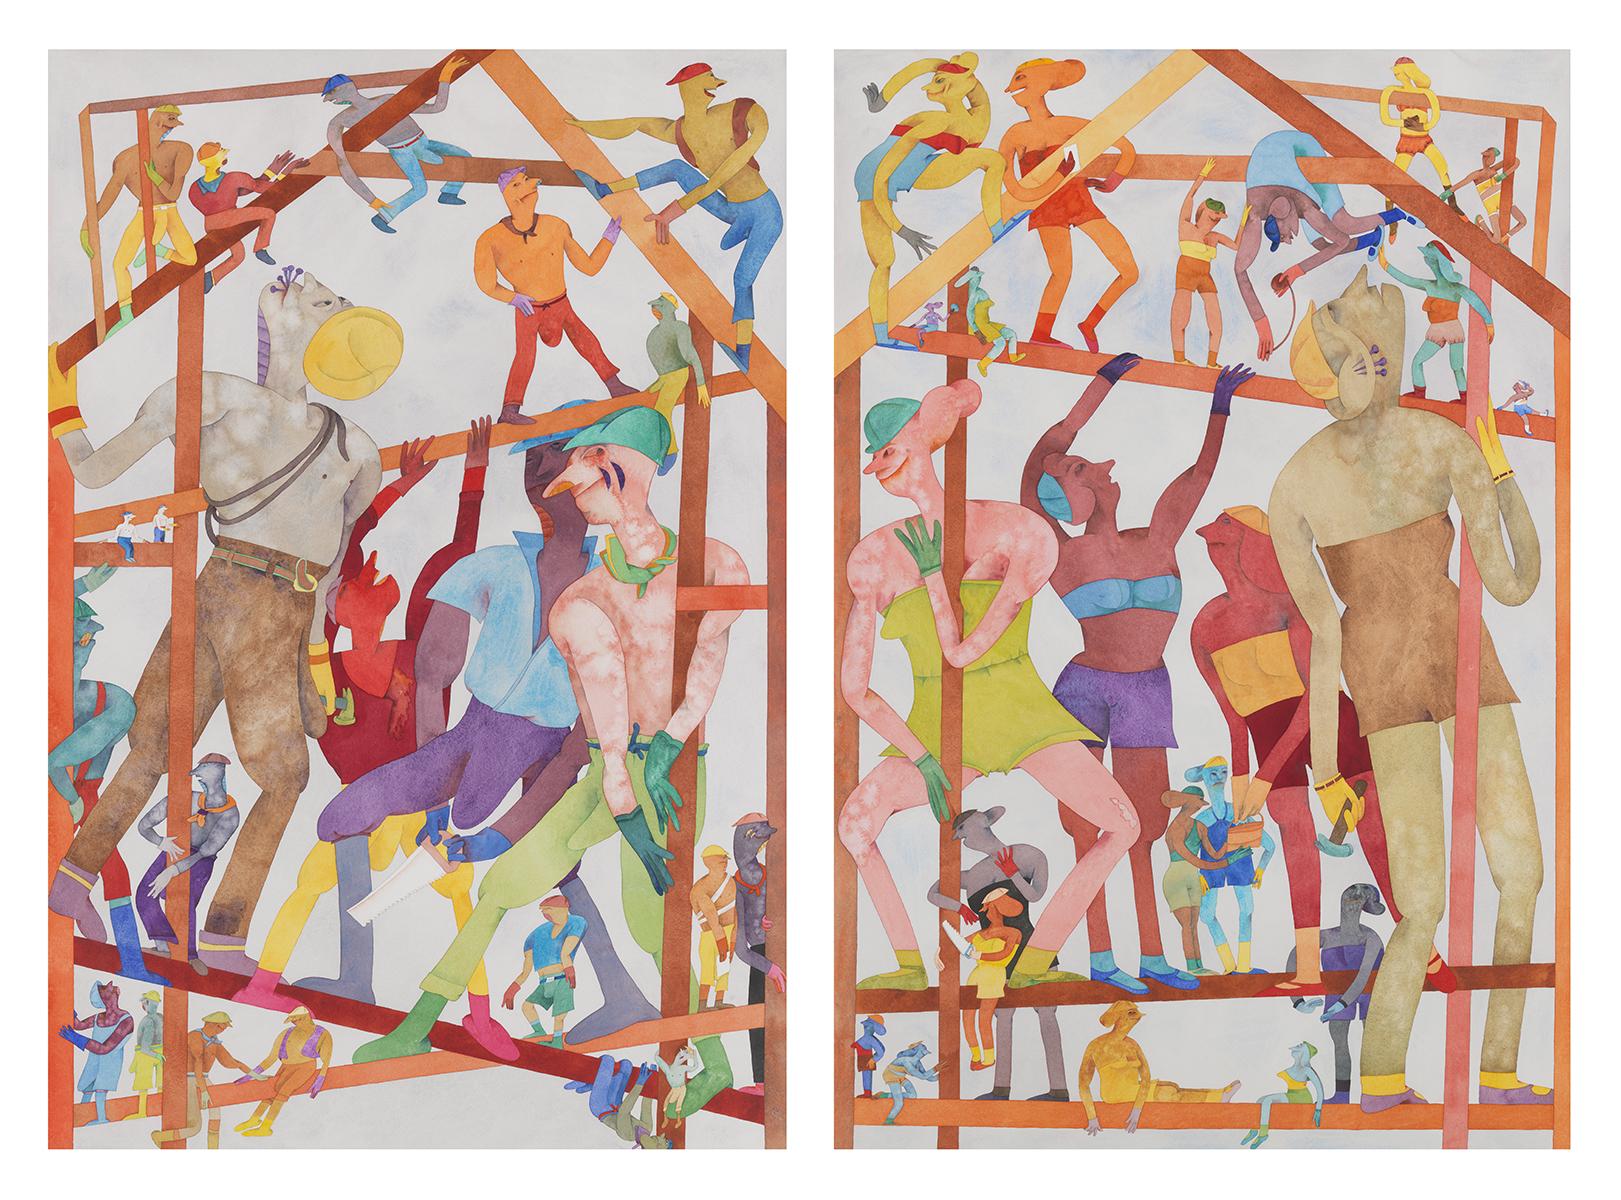 9 Art Events in New York: Leonardo da Vinci, Pierre Cardin, Onyx Ashanti, and More